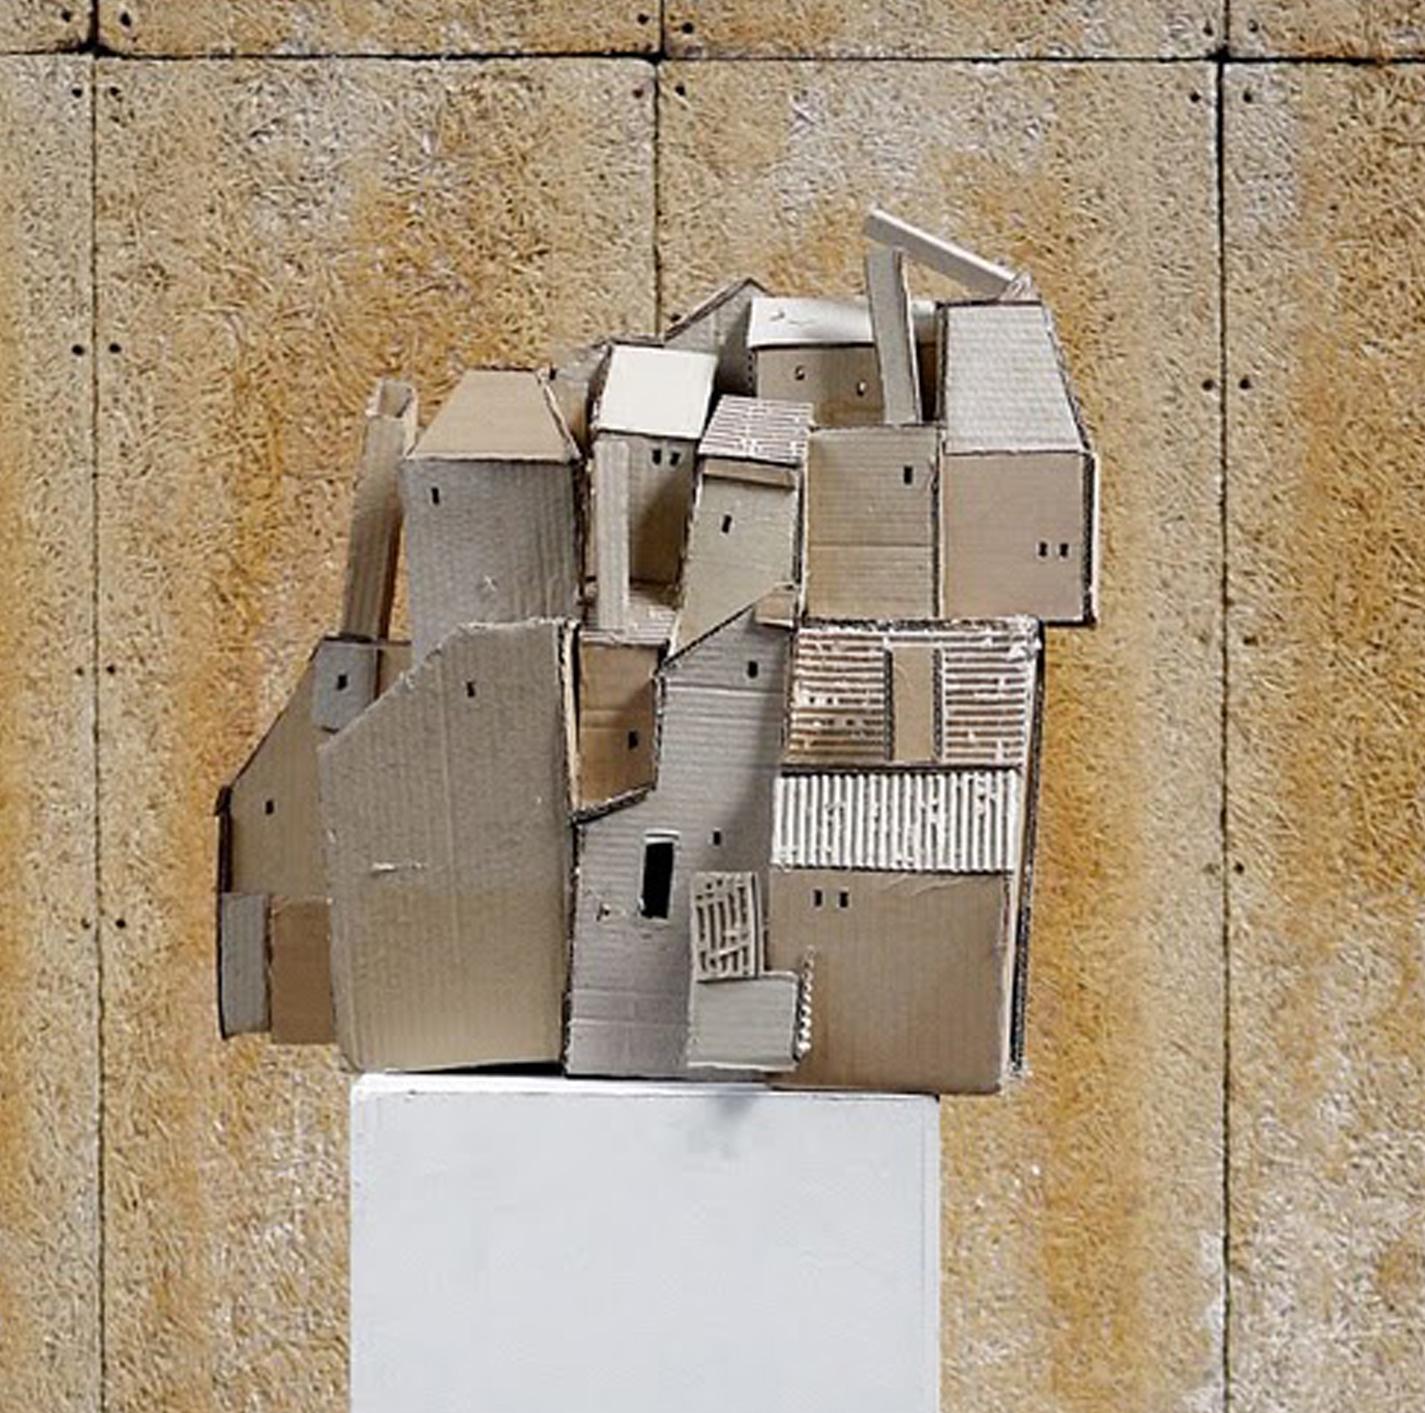 Домики из картона своими руками могут